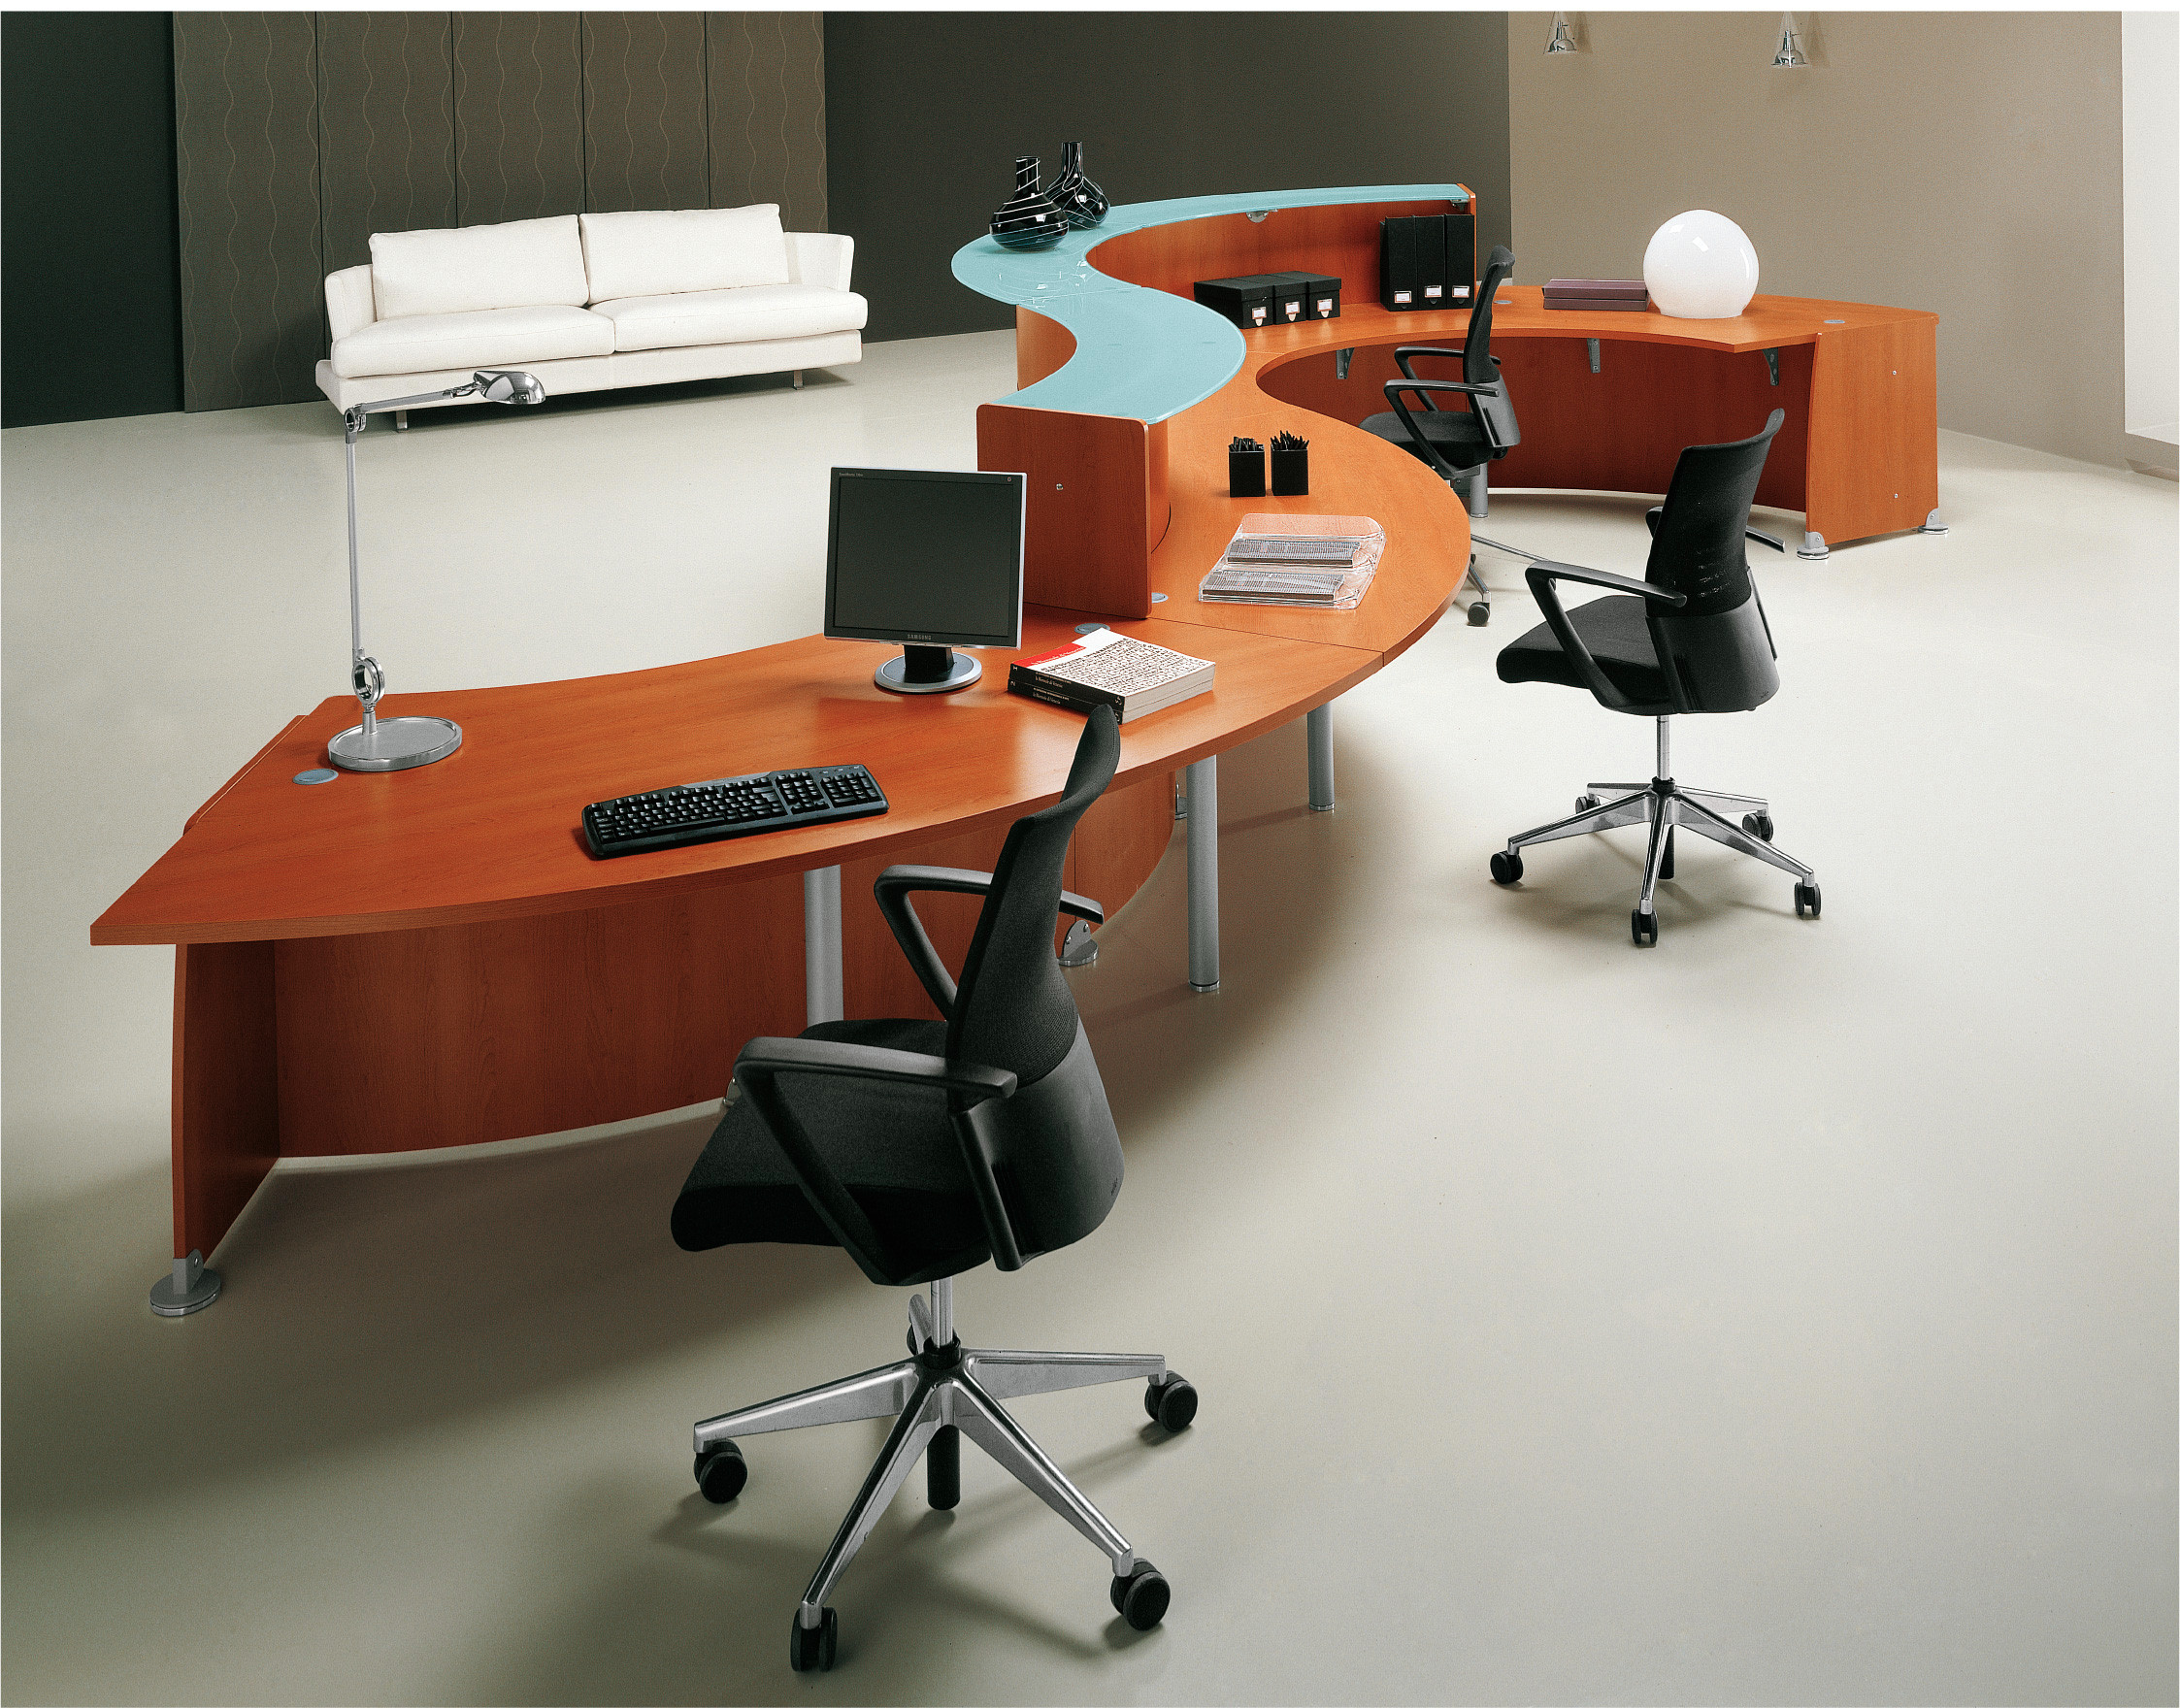 Reception-mid-level-IMAGE 7